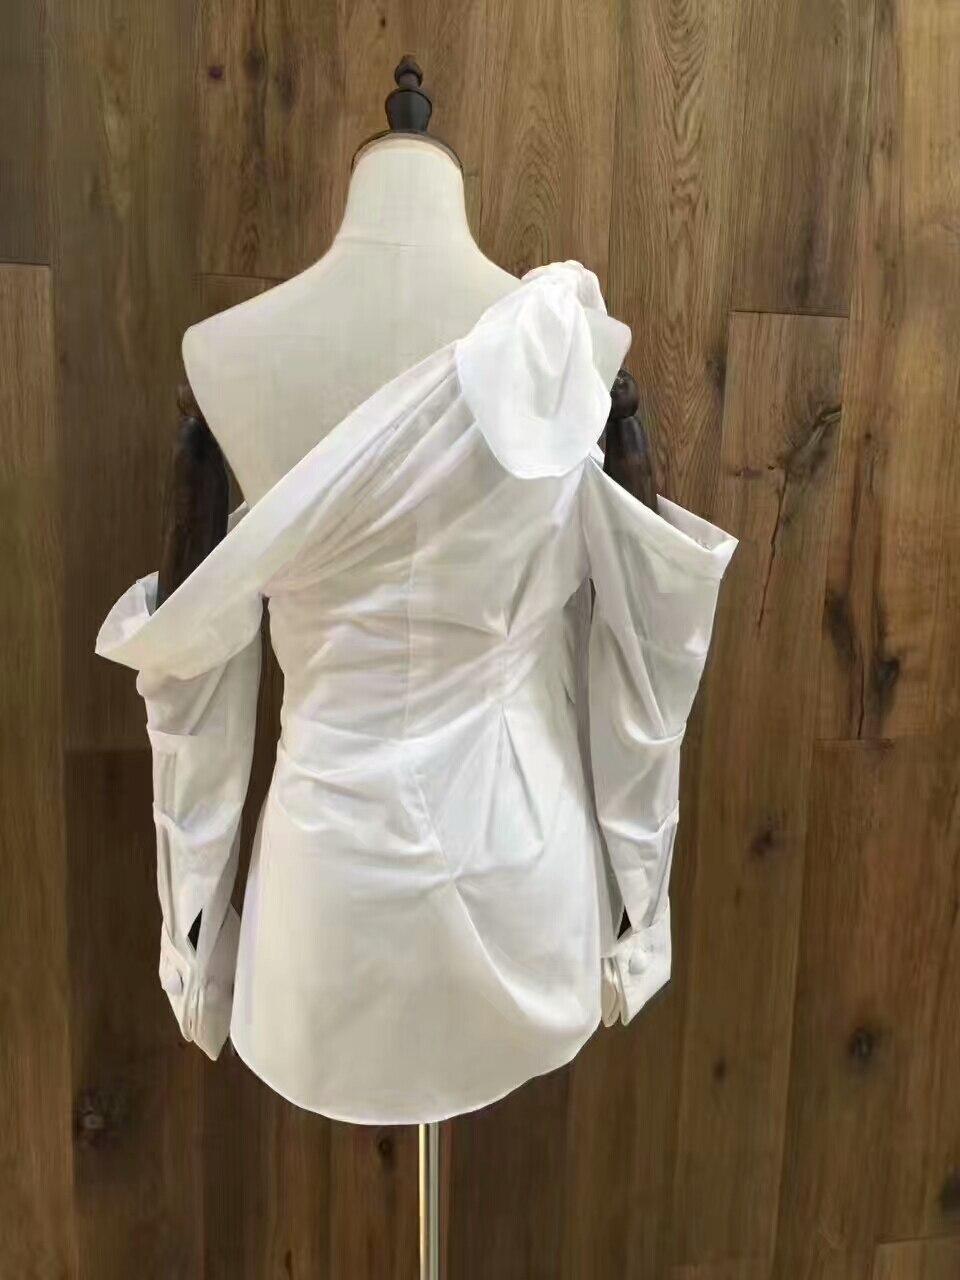 Elegante Diseño Blanca Tops Camisa Las De Zanzea 2017 Casual Sexy Blusas Increíble Feminina Hombro Mujeres Moda Mujer Para Blusa rCUFWrqS